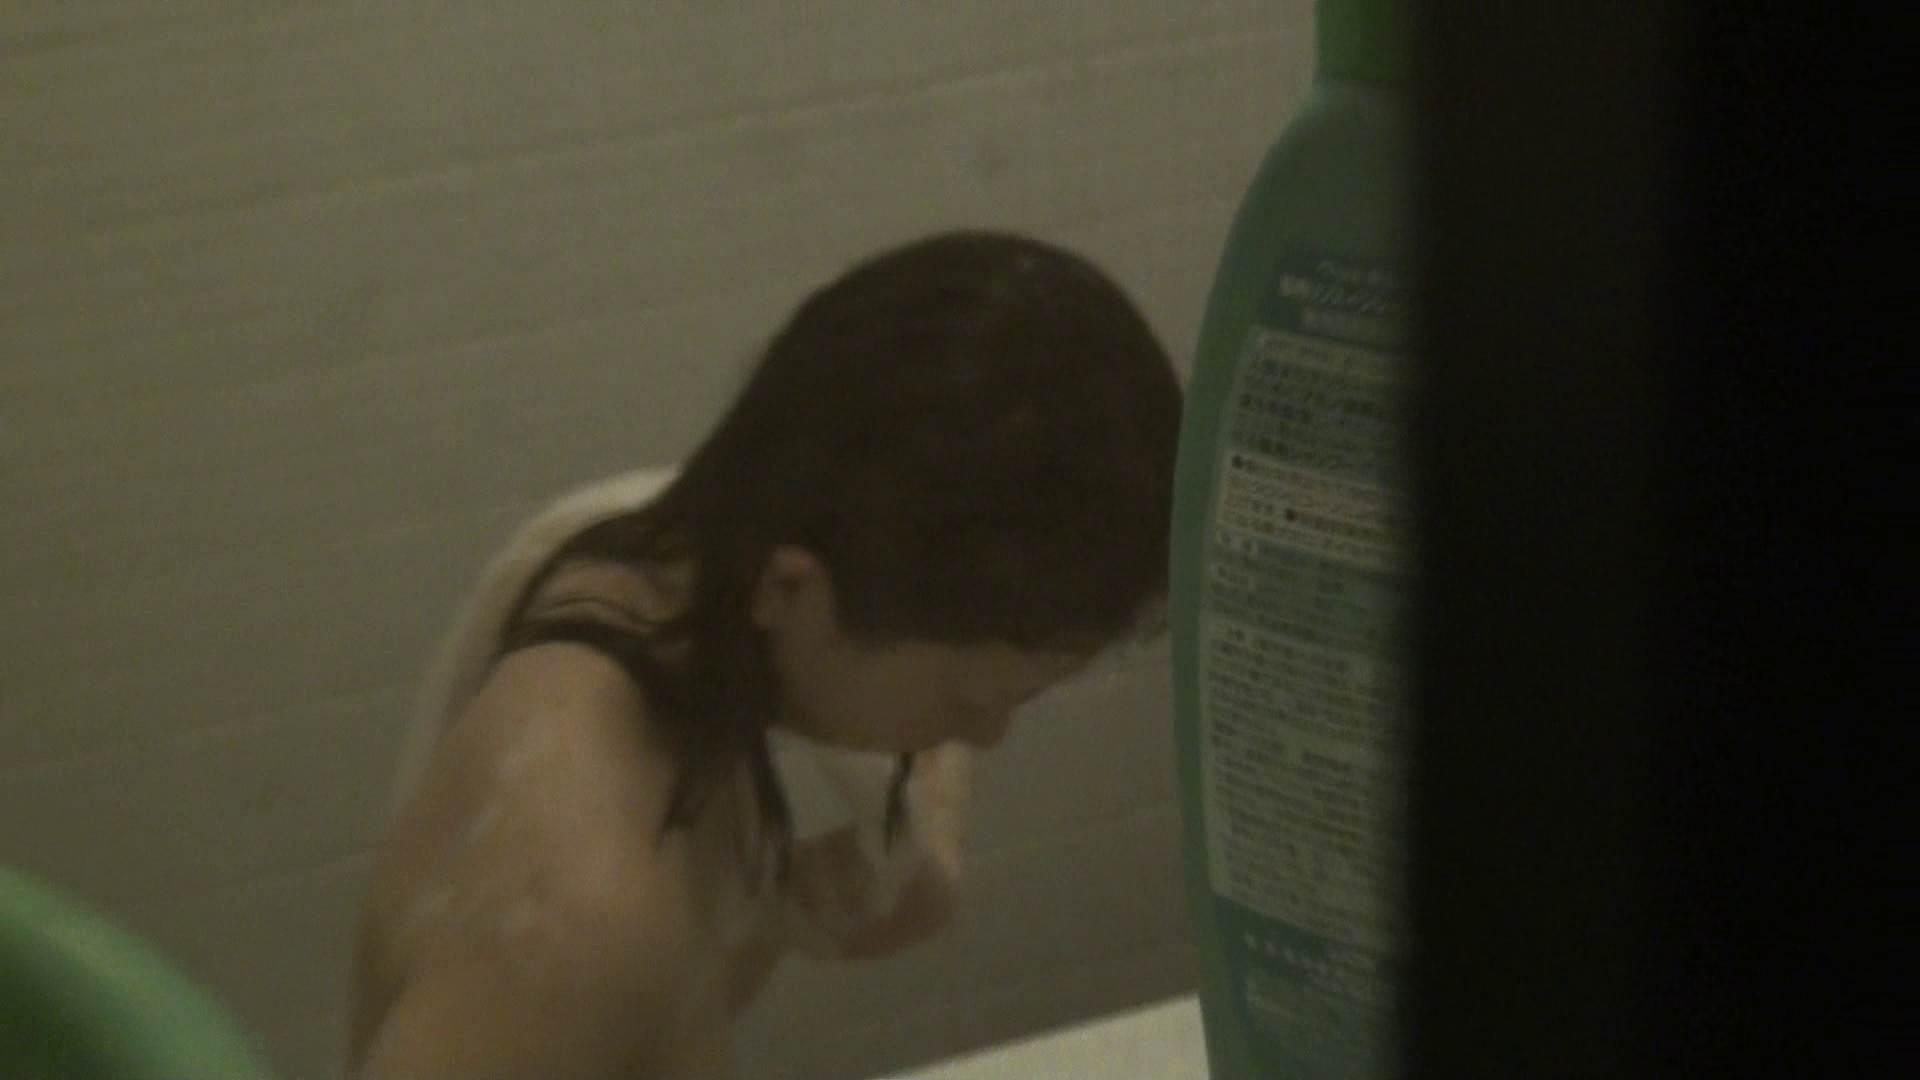 vol.06顔を洗い流す極上お女市さんの裸体をハイビジョンで!風呂上り着替え必見! お姉さん攻略 スケベ動画紹介 68画像 2